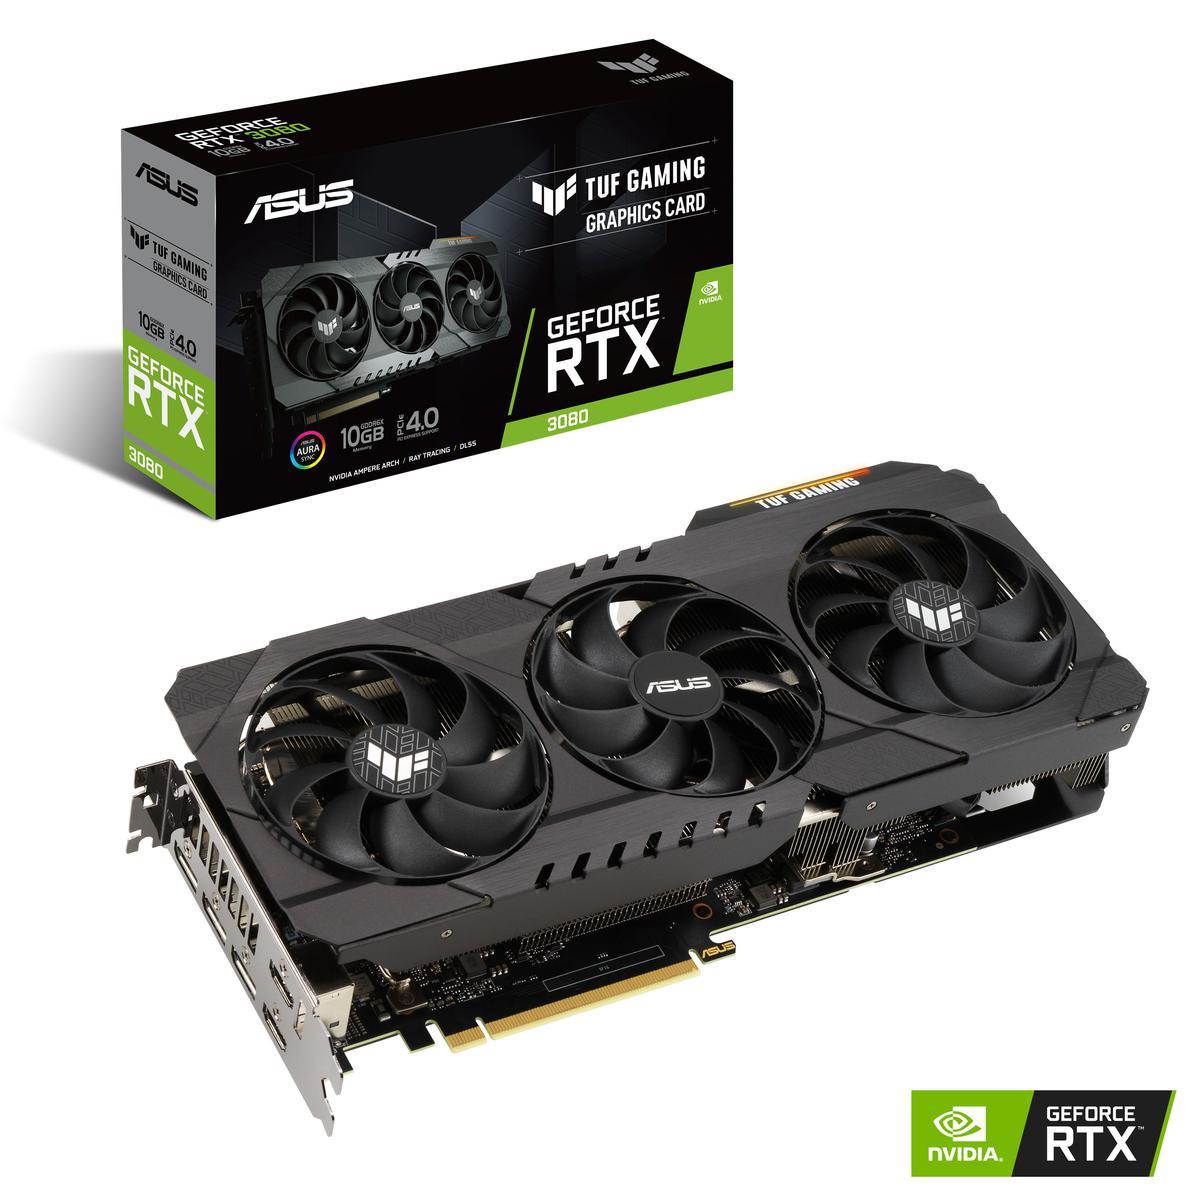 Asus GeForce RTX 3080 10 GB TUF GAMING OC Video Card